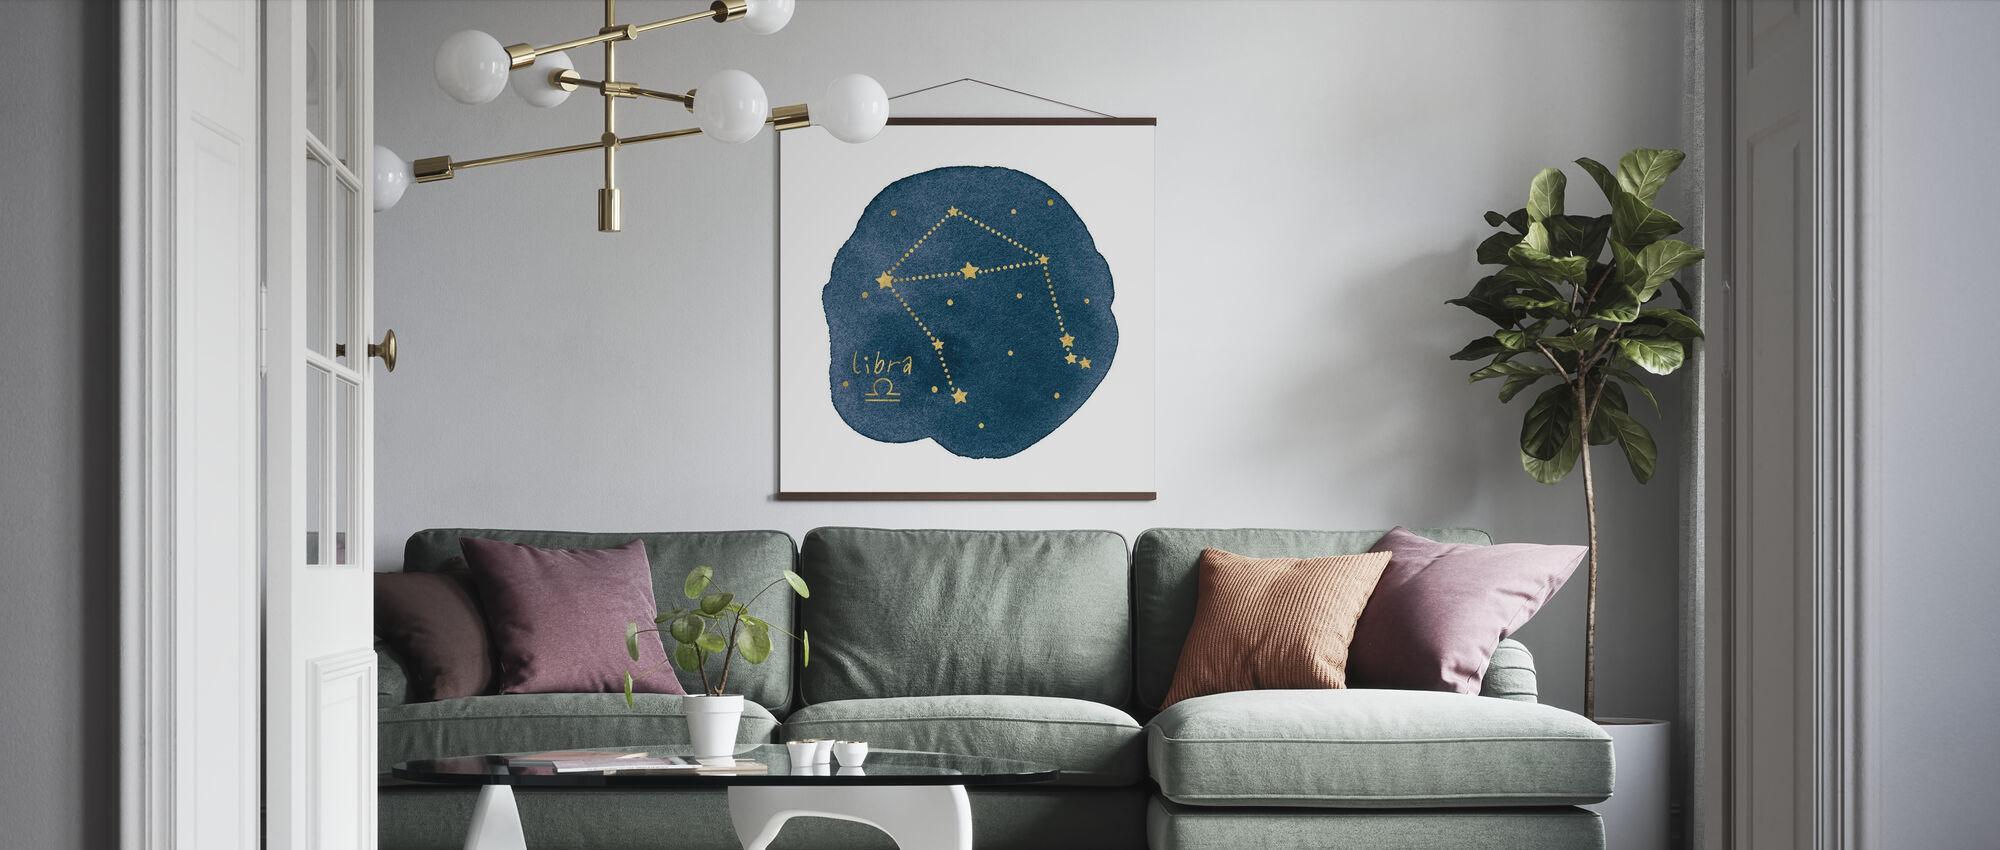 Horoskop Waage - Poster - Wohnzimmer